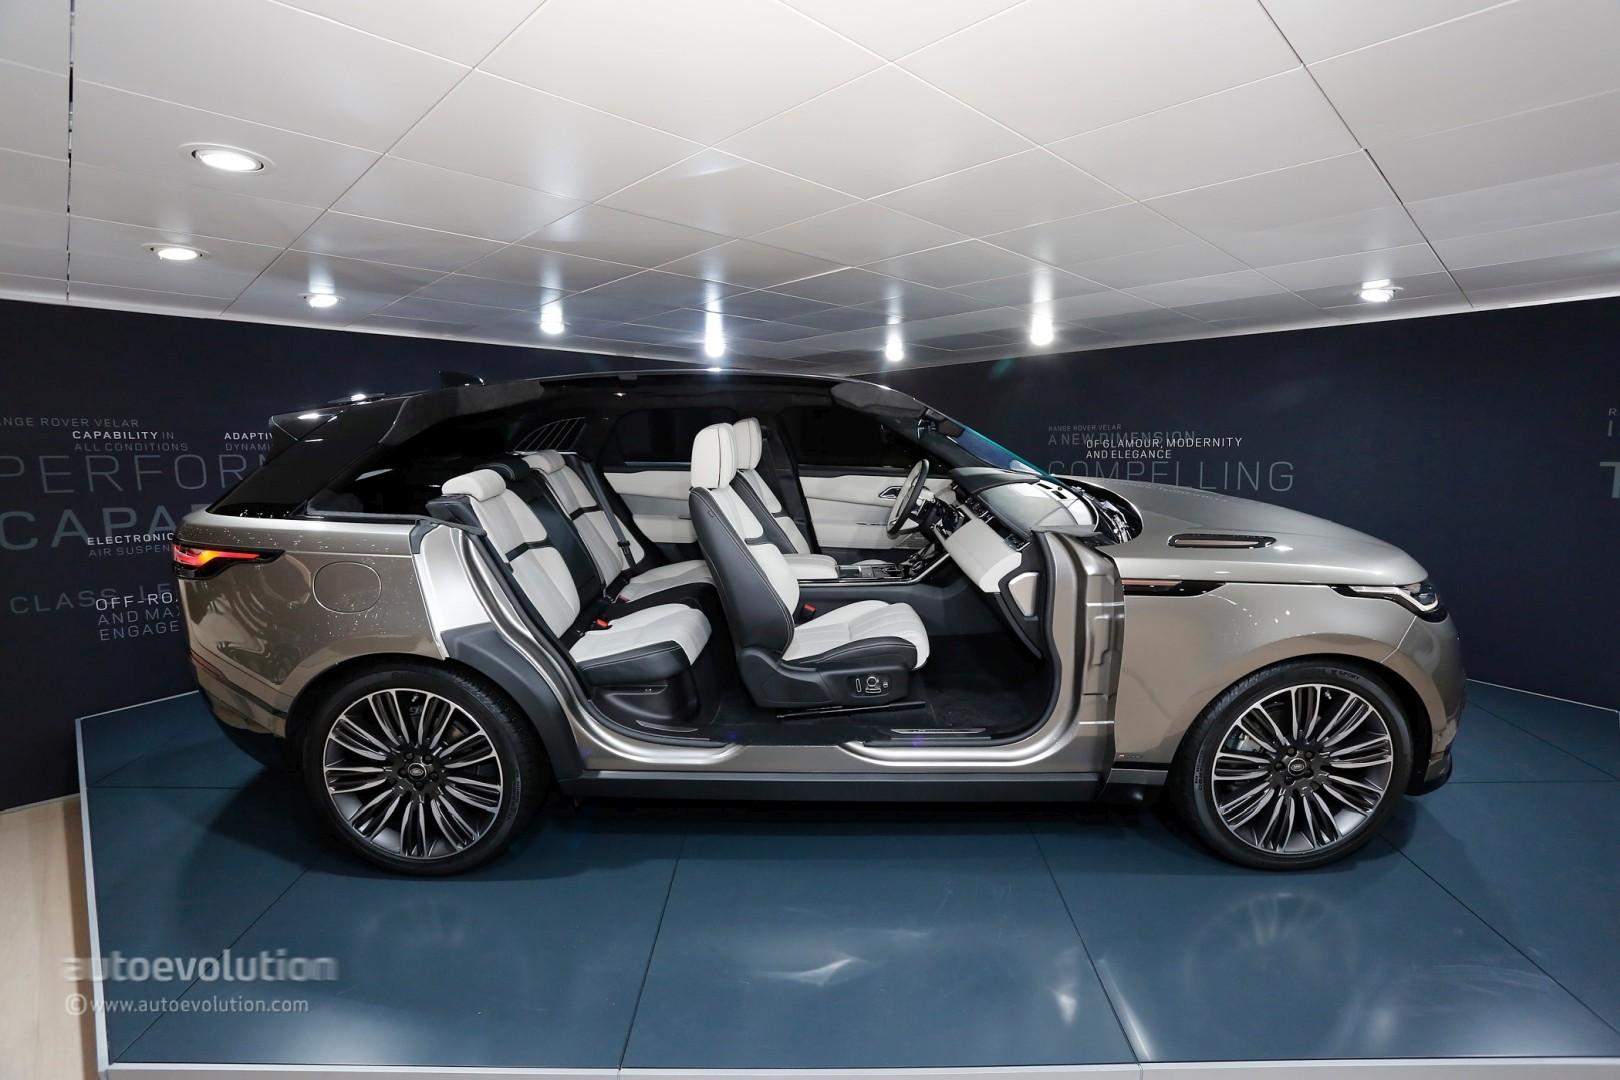 Land Rover Evoque Convertible >> Range Rover Velar Convertible Rendering Looks Like a Luxury Boat - autoevolution